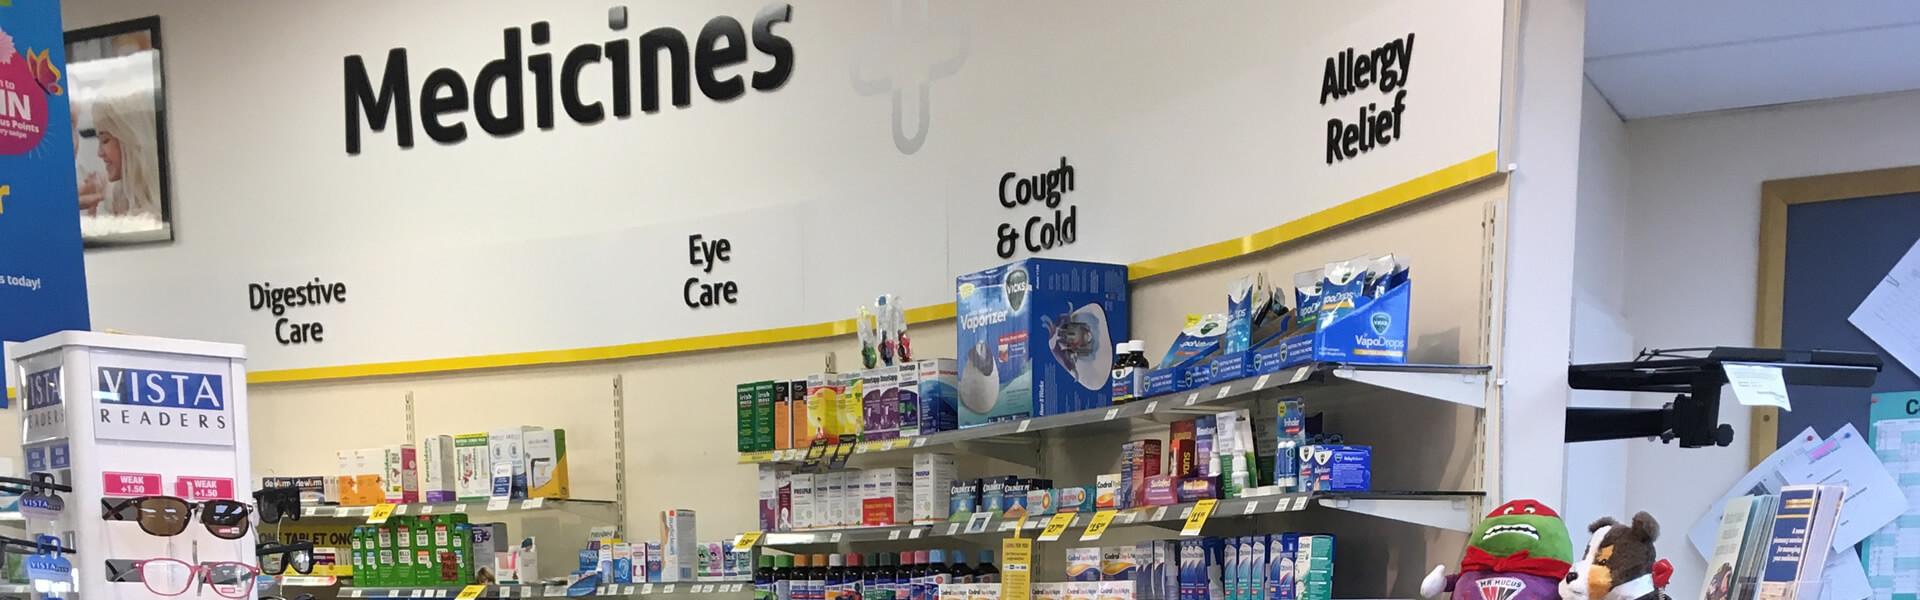 Store Interior 05 At Life Pharmacy Blenheim In Marlborough NZ